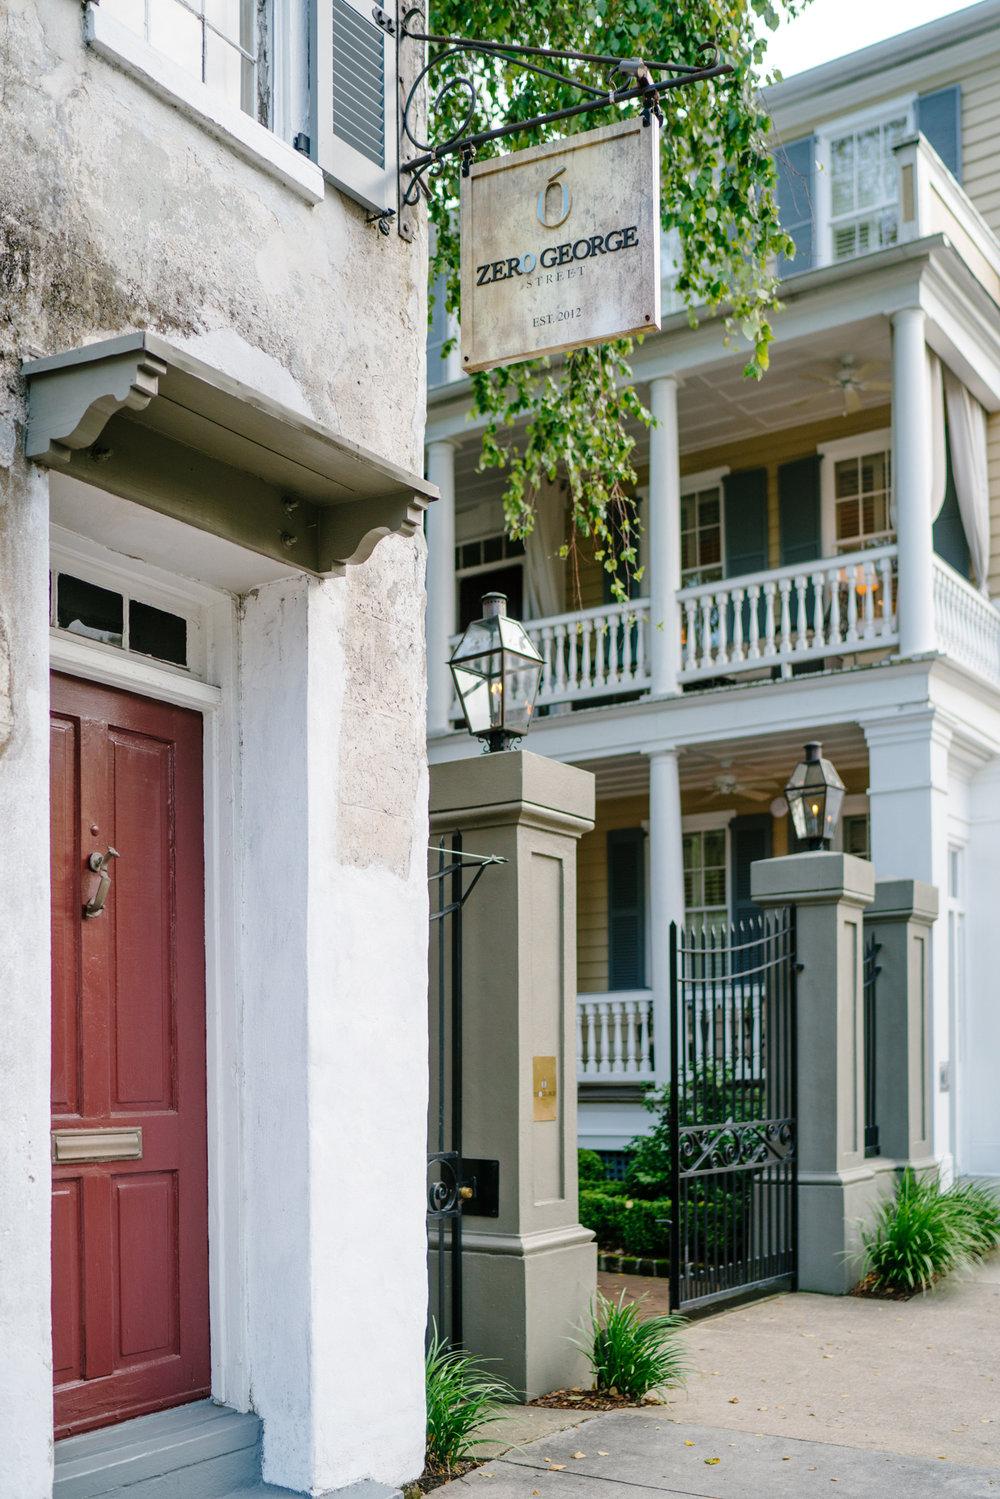 Zero George Street in Charleston   Never Settle Travel